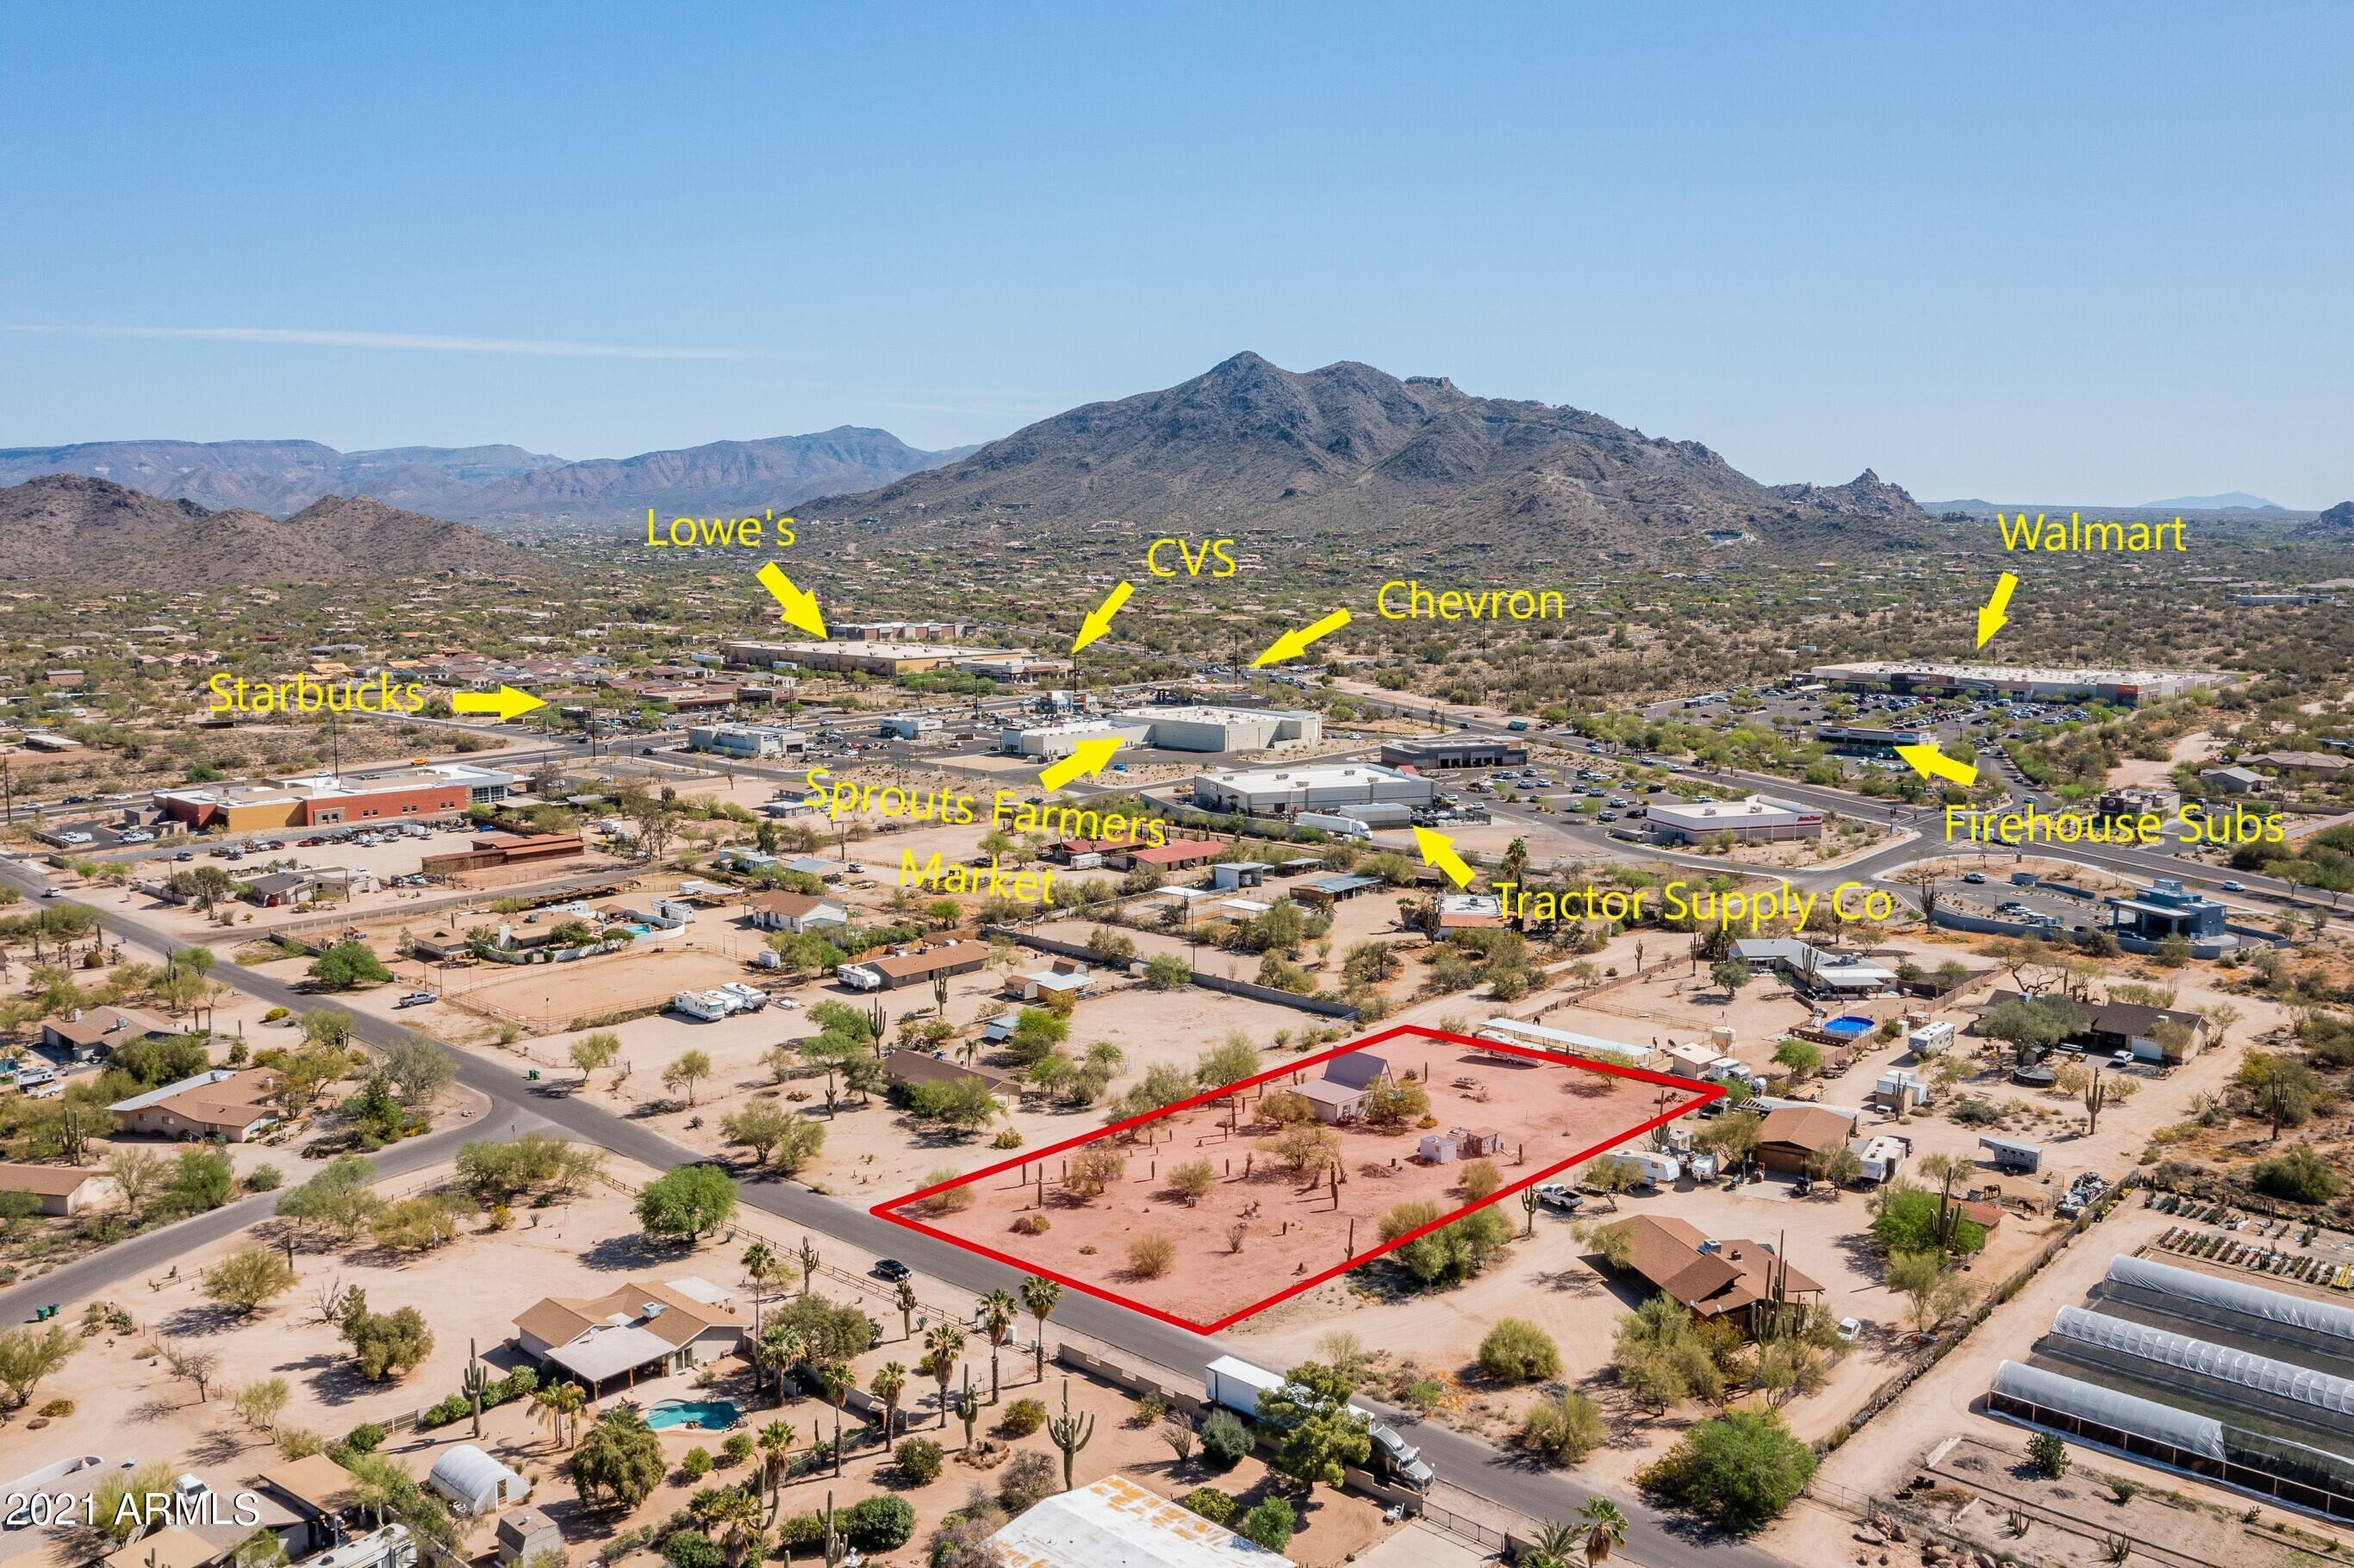 34047 N 52nd Street, Cave Creek, AZ 85331, ,Land,For Sale,34047 N 52nd Street,6218881